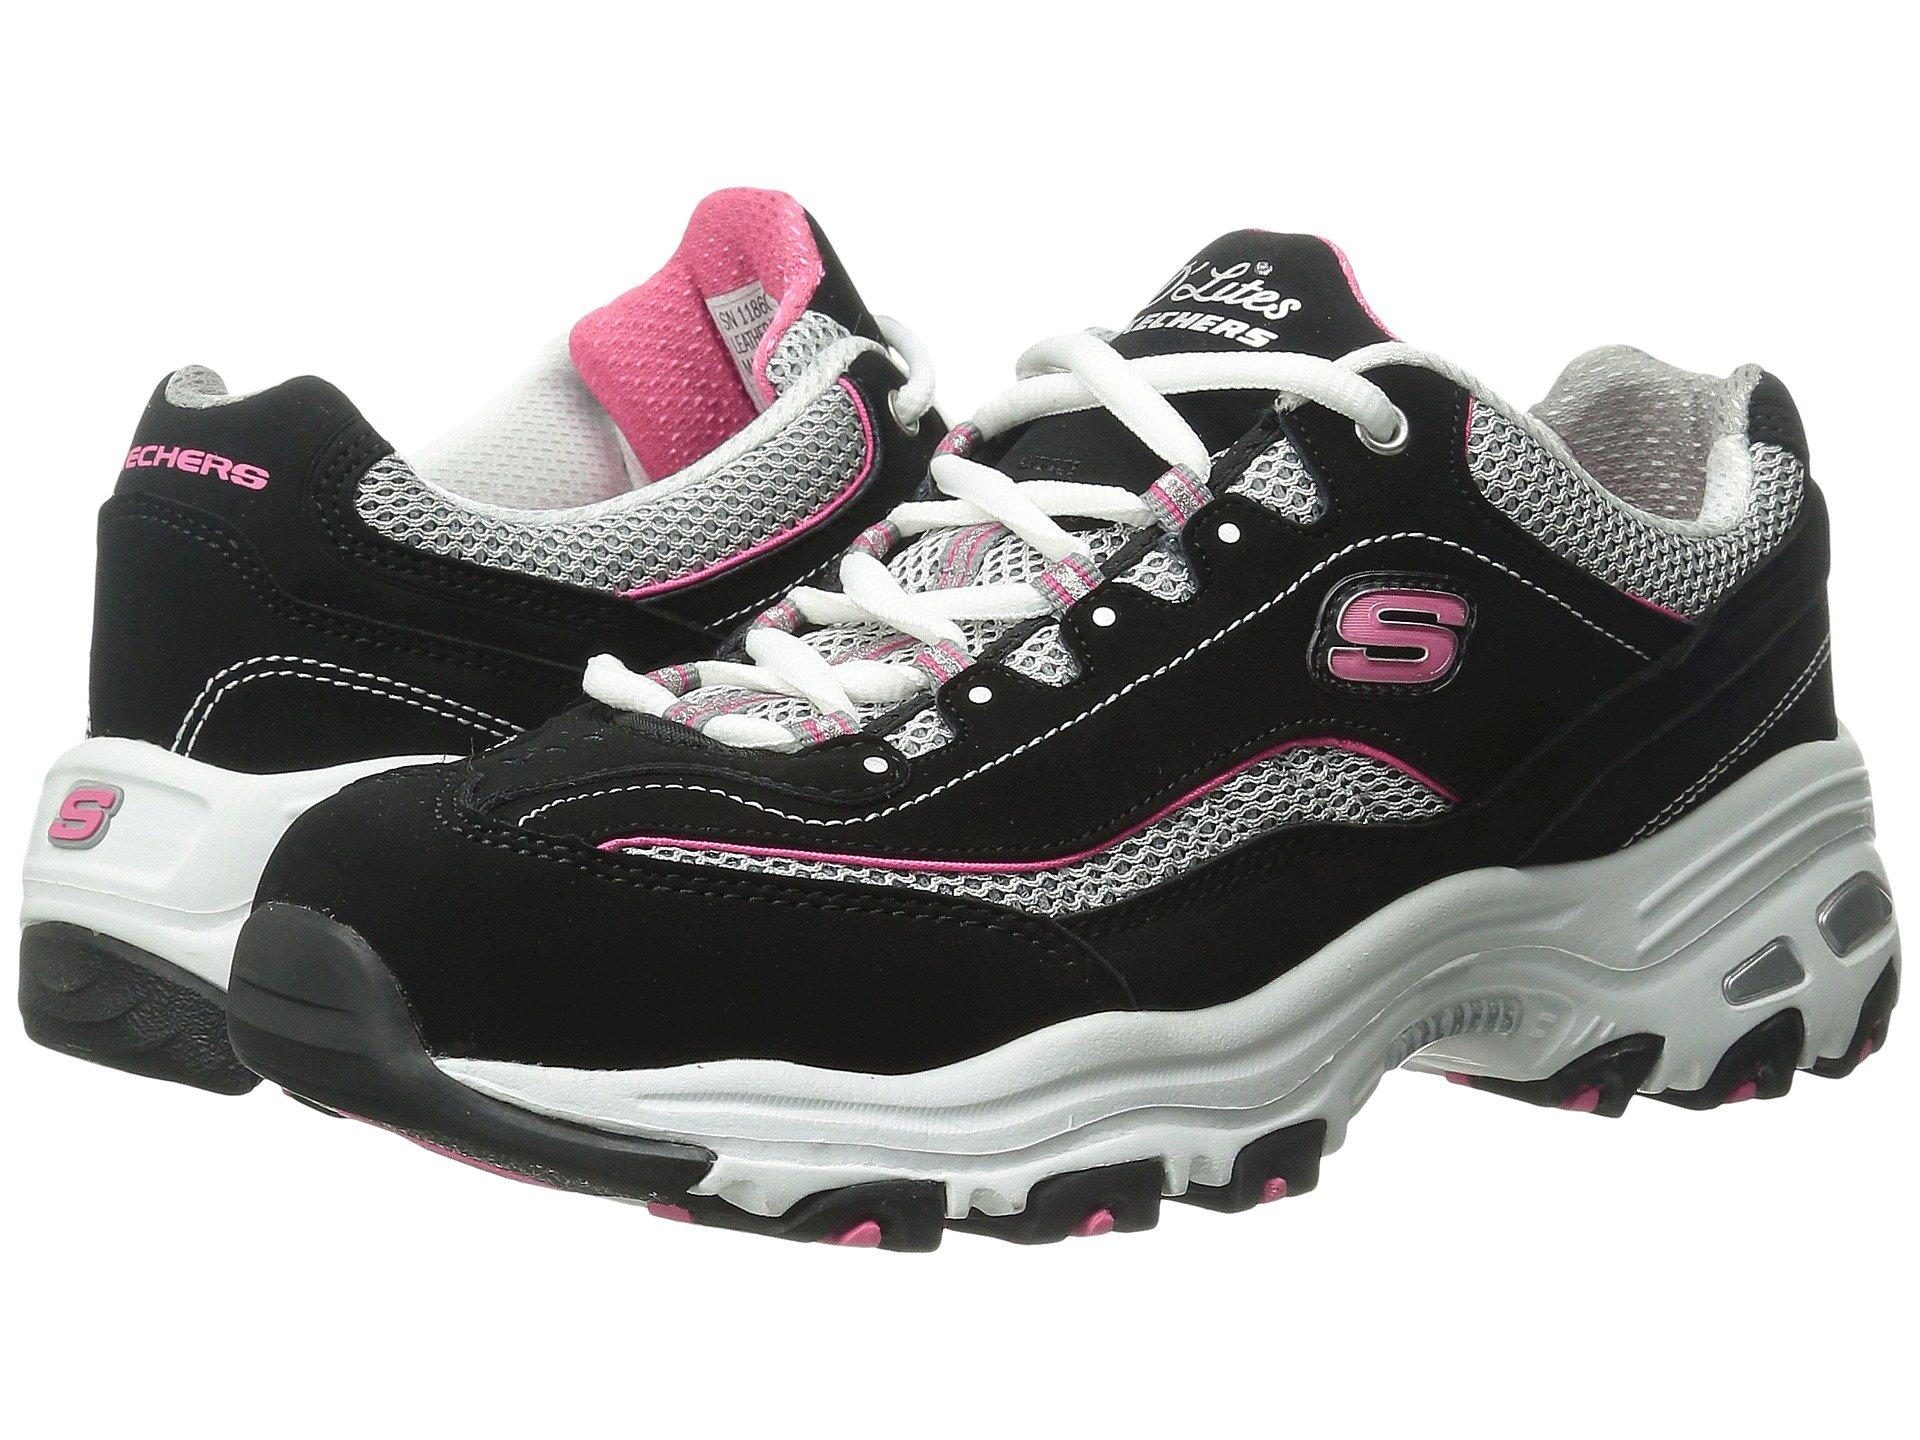 Sneakers Athletic Shoes Navy Women Shipped Free At Zappos Sandal Connec Arizona Fuchsia Woman 36 Dlites Life Saver